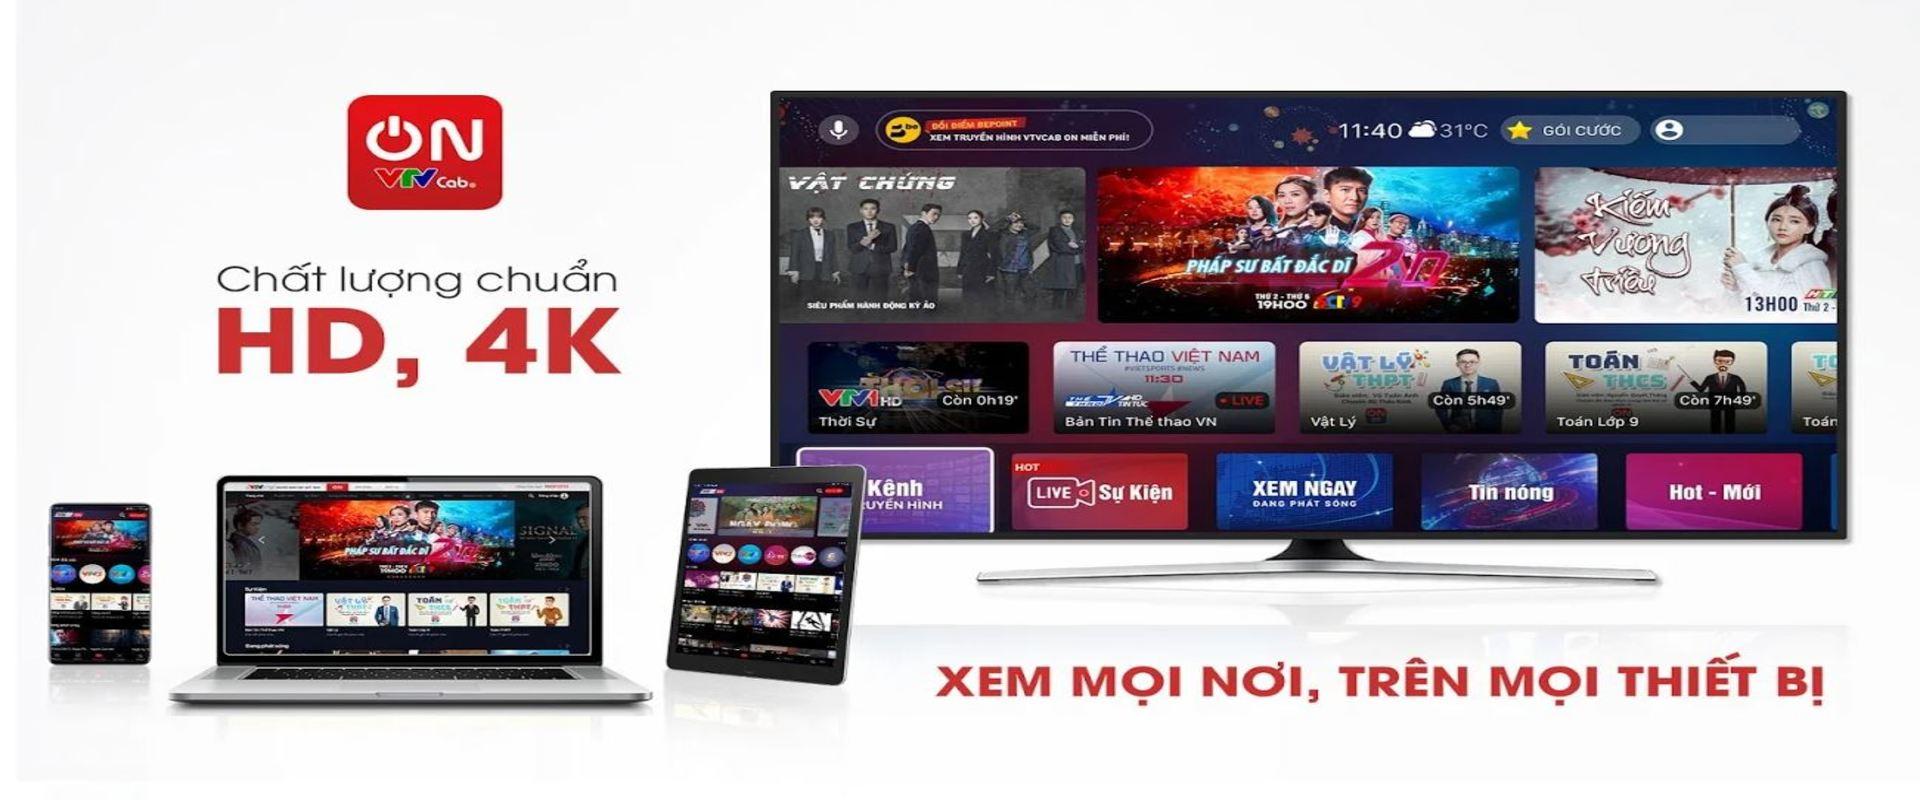 VTVcab ON: Trực tiếp bóng đá – Xem tivi online